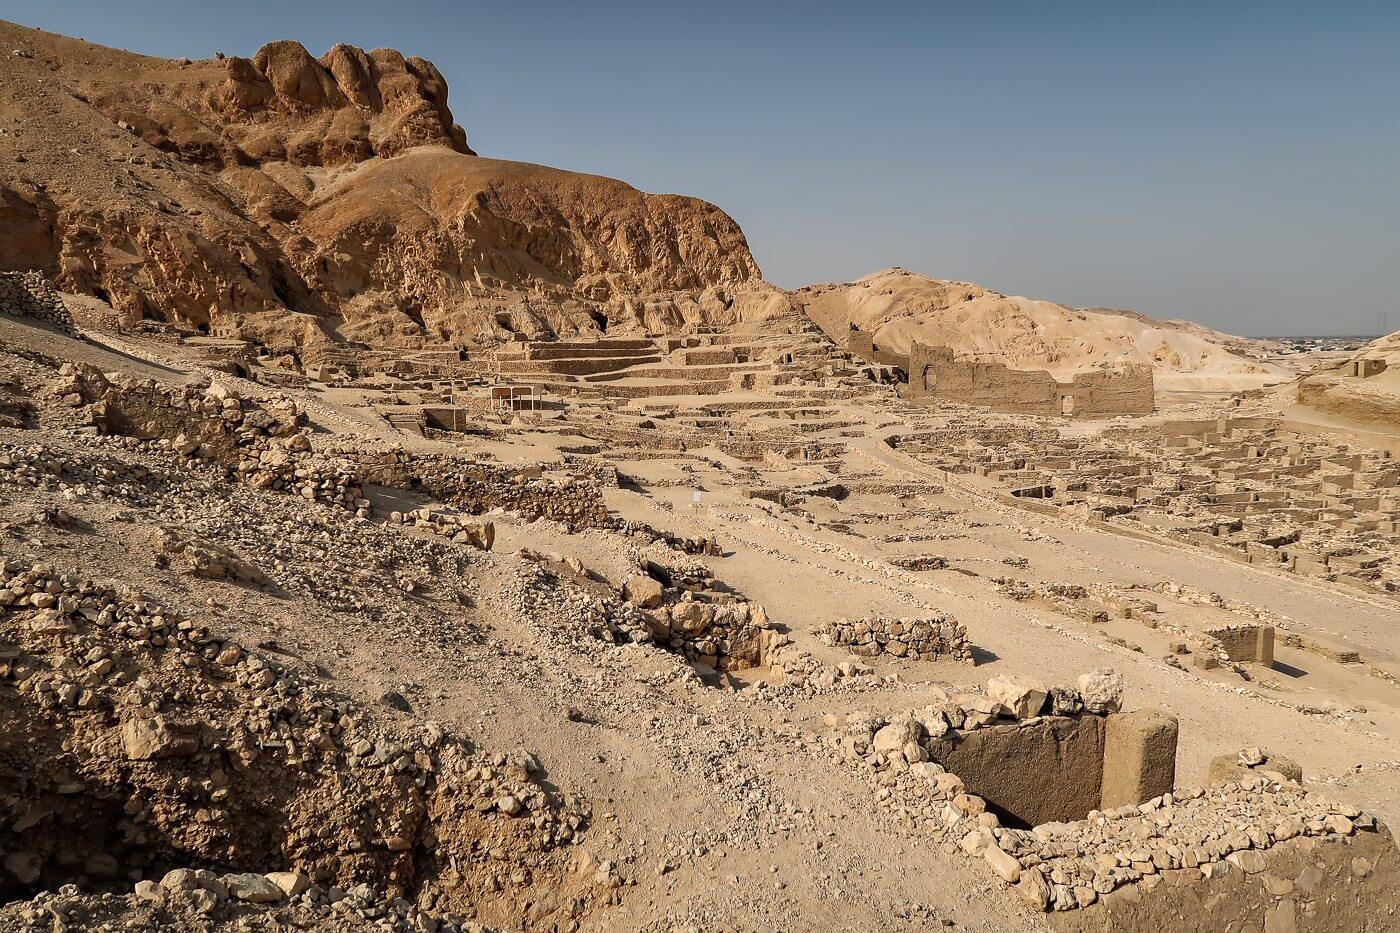 Deir el Medina, Luxor, Egypt - Photo by Zed Sindelar of CuriousZed Photography